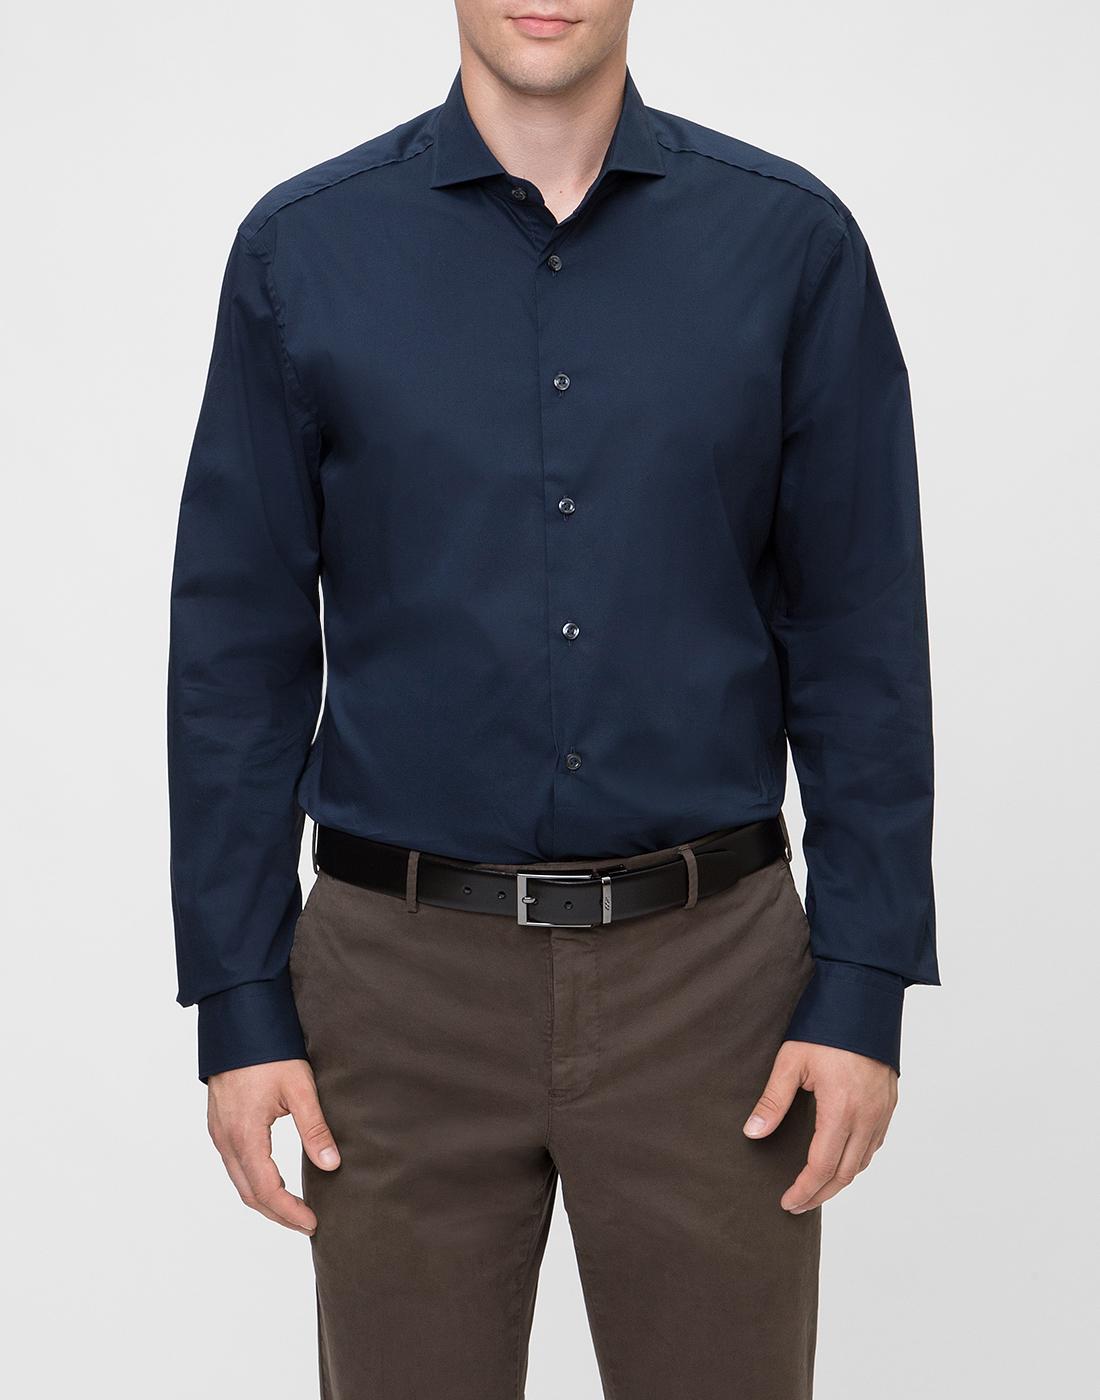 Мужская темно-синяя рубашка Van Laack S130050/790-2